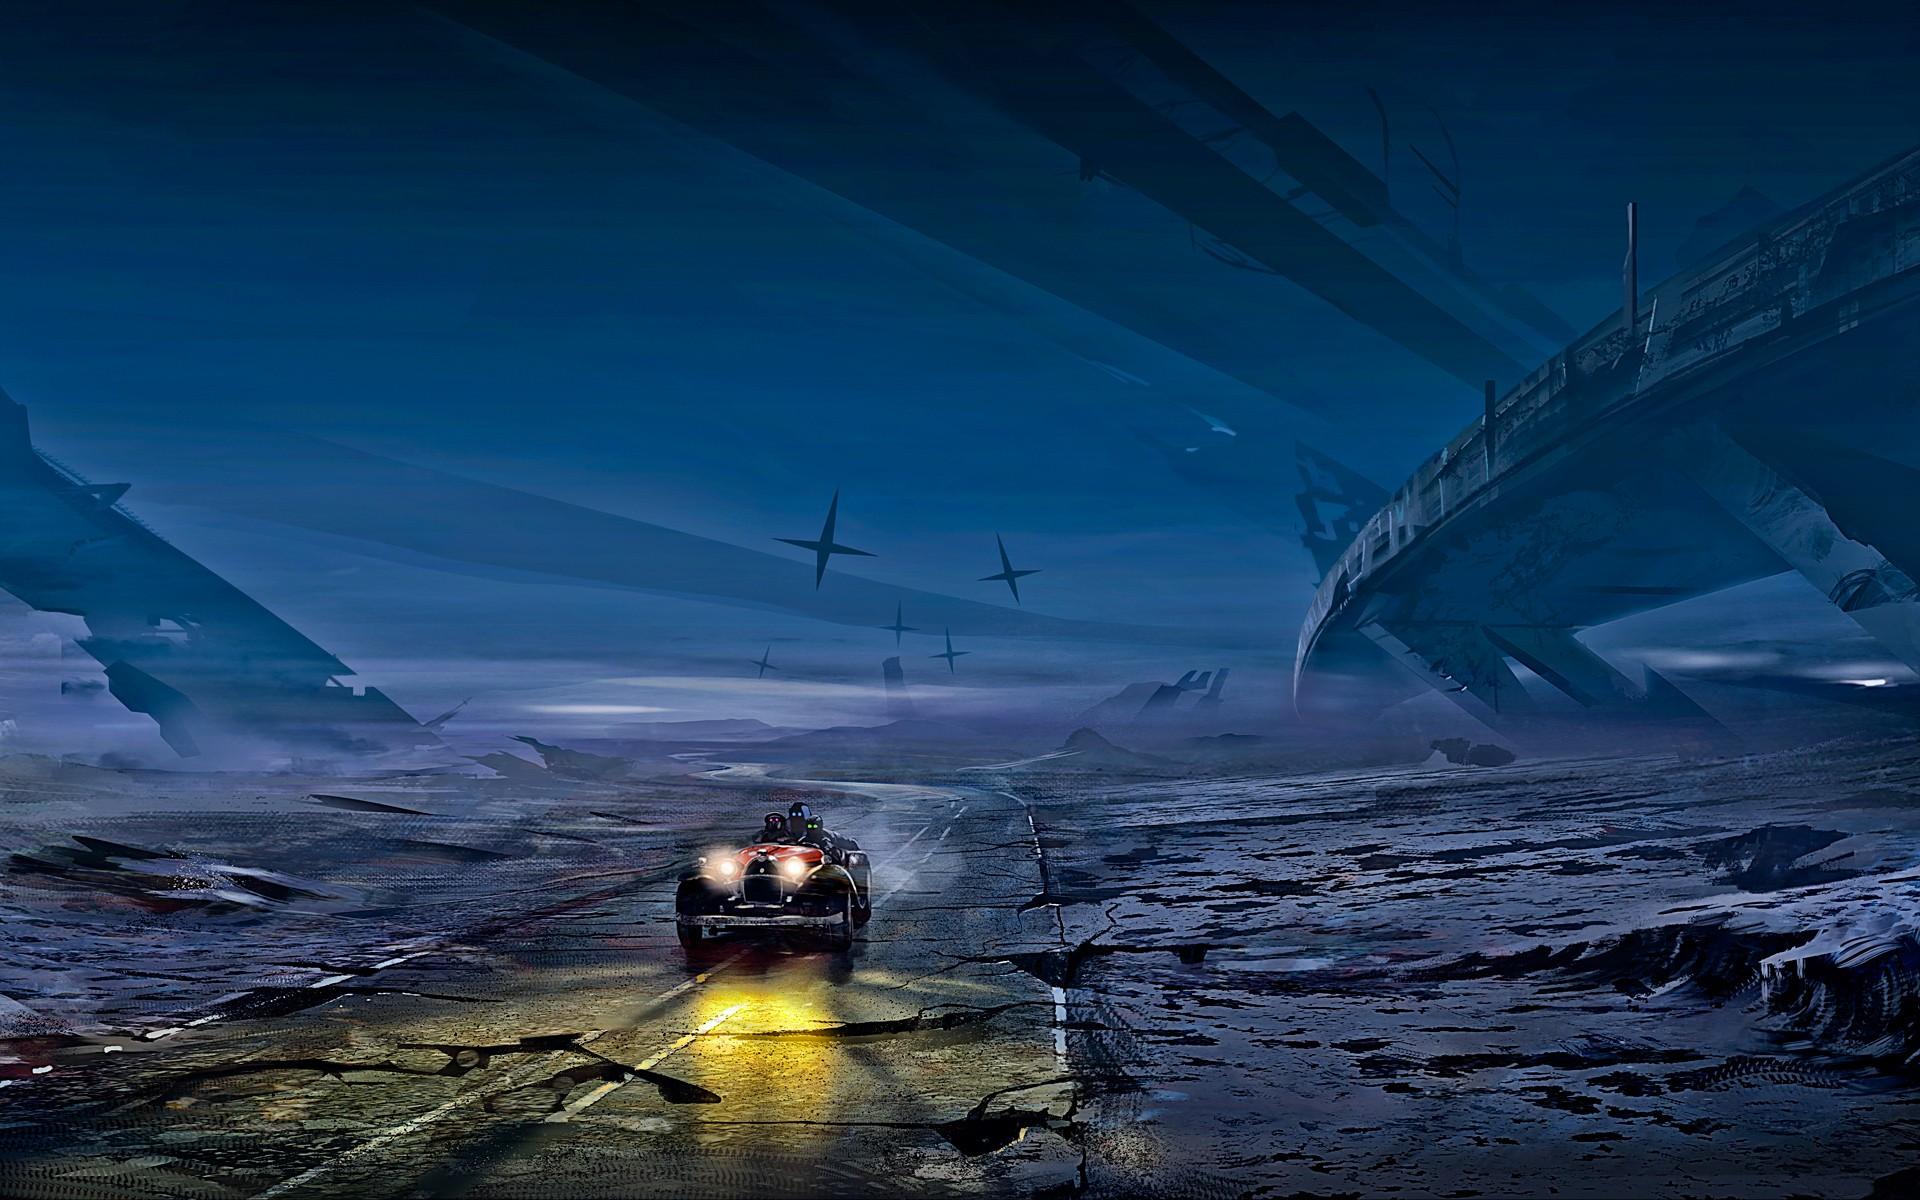 science fiction romantically apocalyptic  futuristic